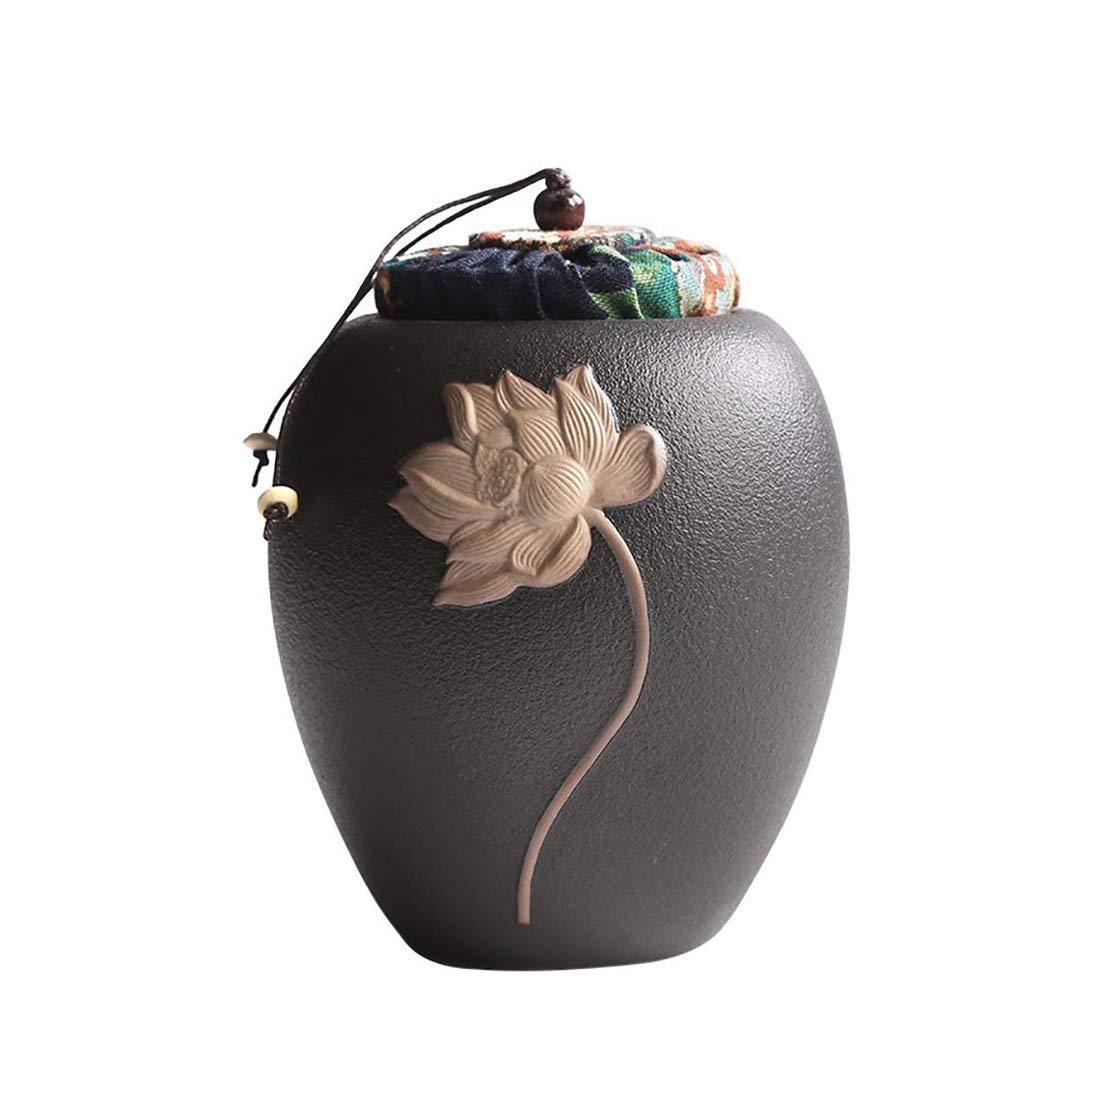 LiRongPing Creative Ceramic Moisture-Proof Pet Commemorative Jar Commemorating Cat Dog Small Animal Coffin